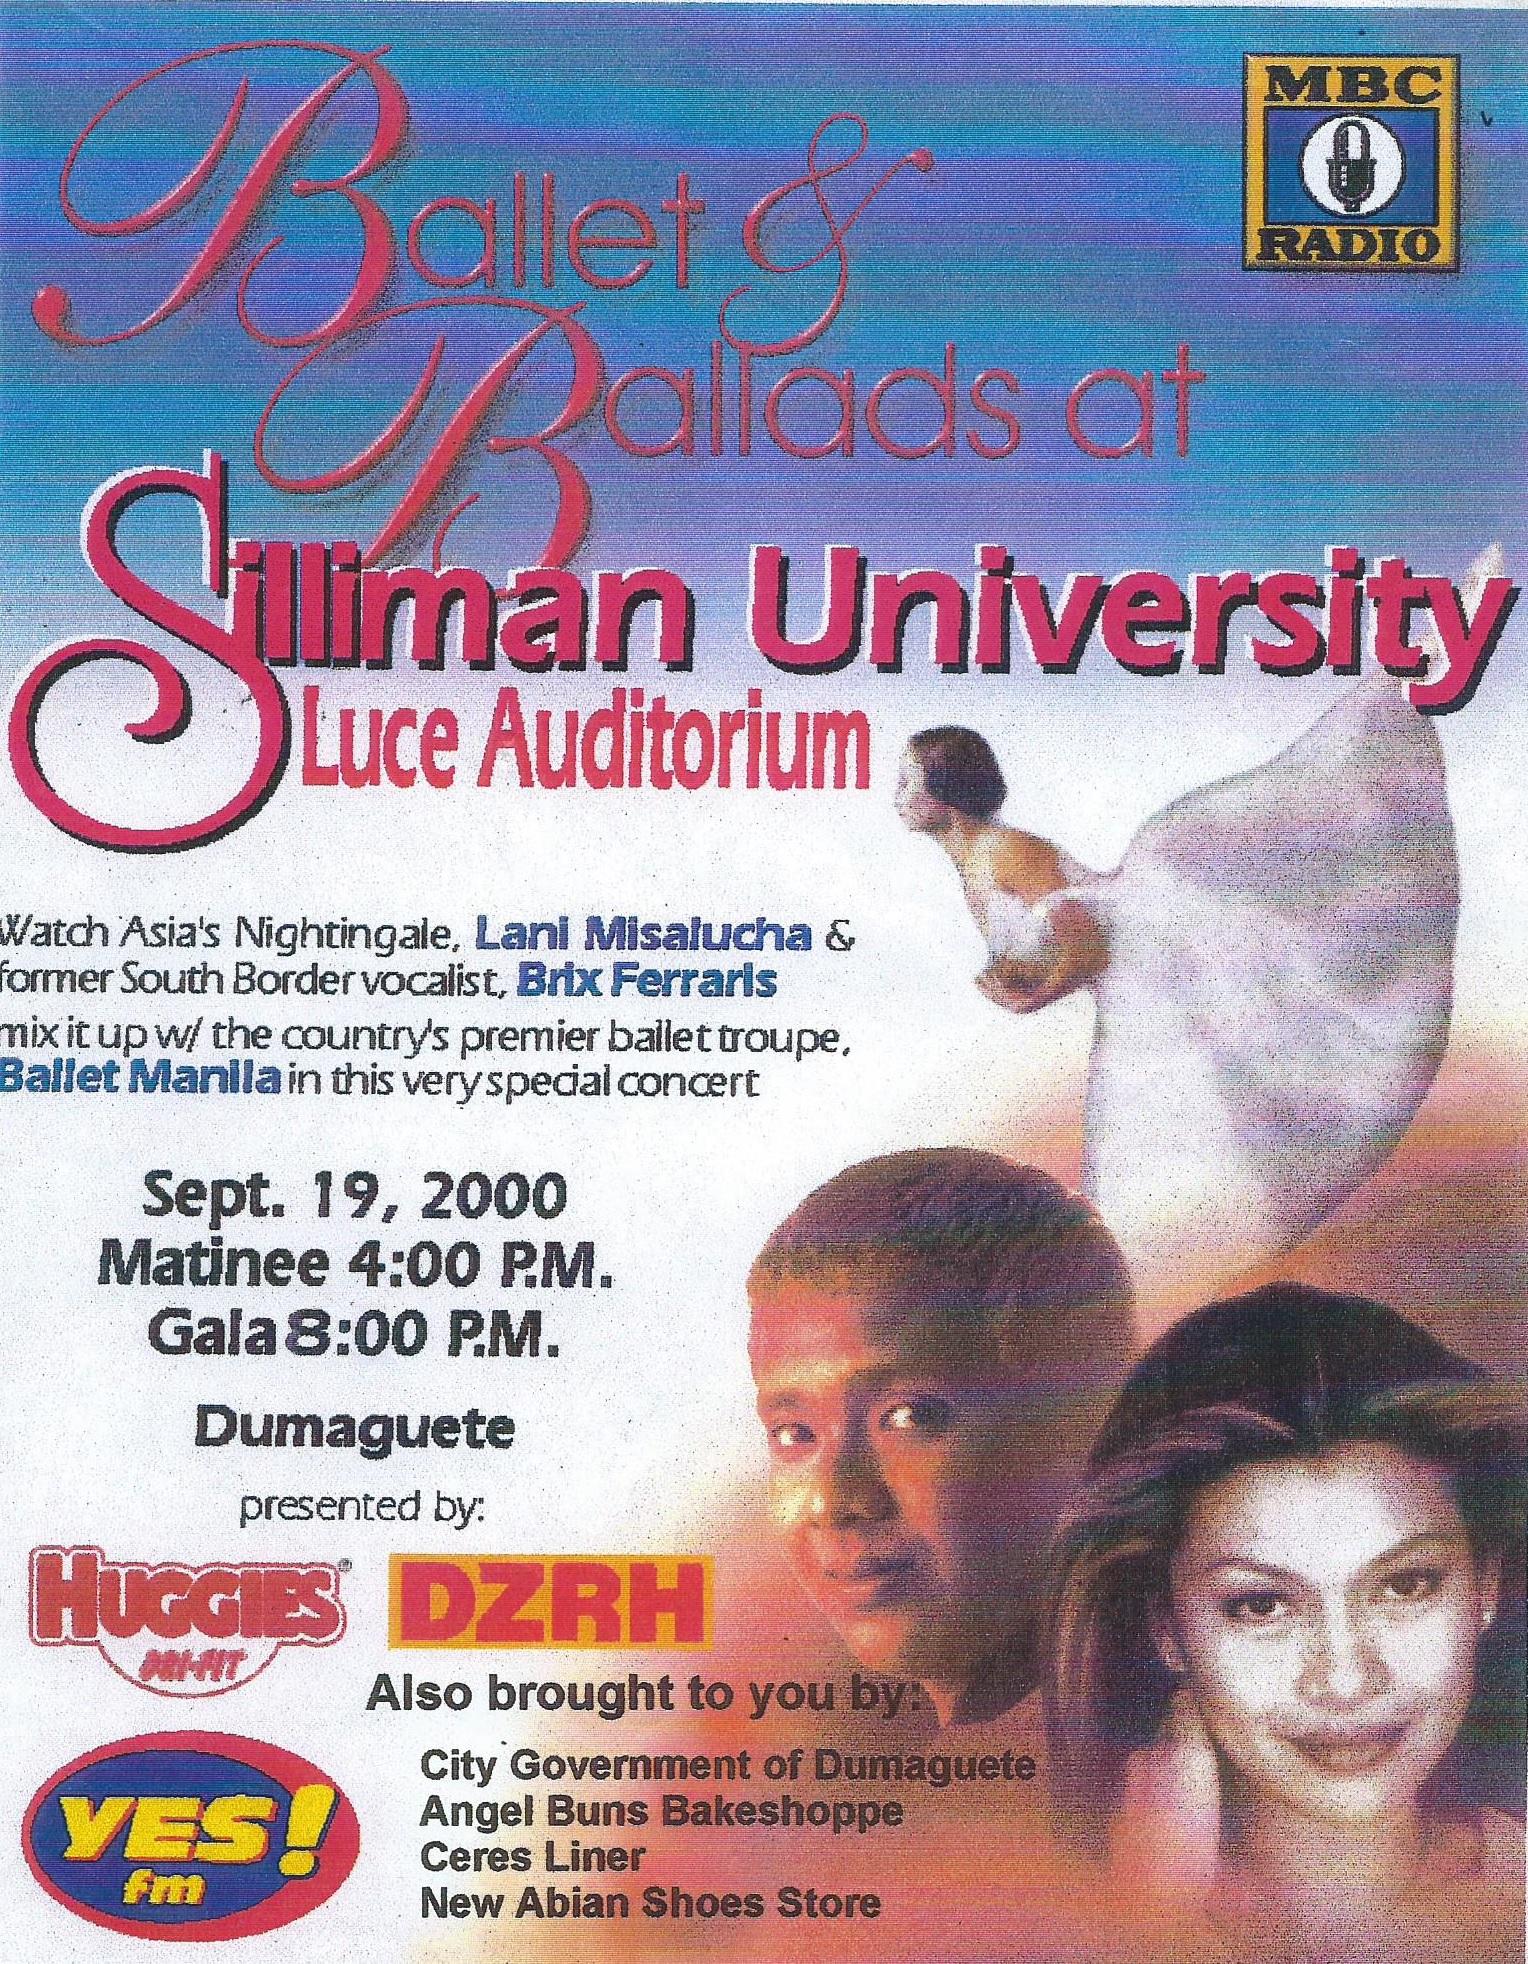 Leaflet for Dumaguete show with Lani Misalucha and Brix Ferraris, 2000